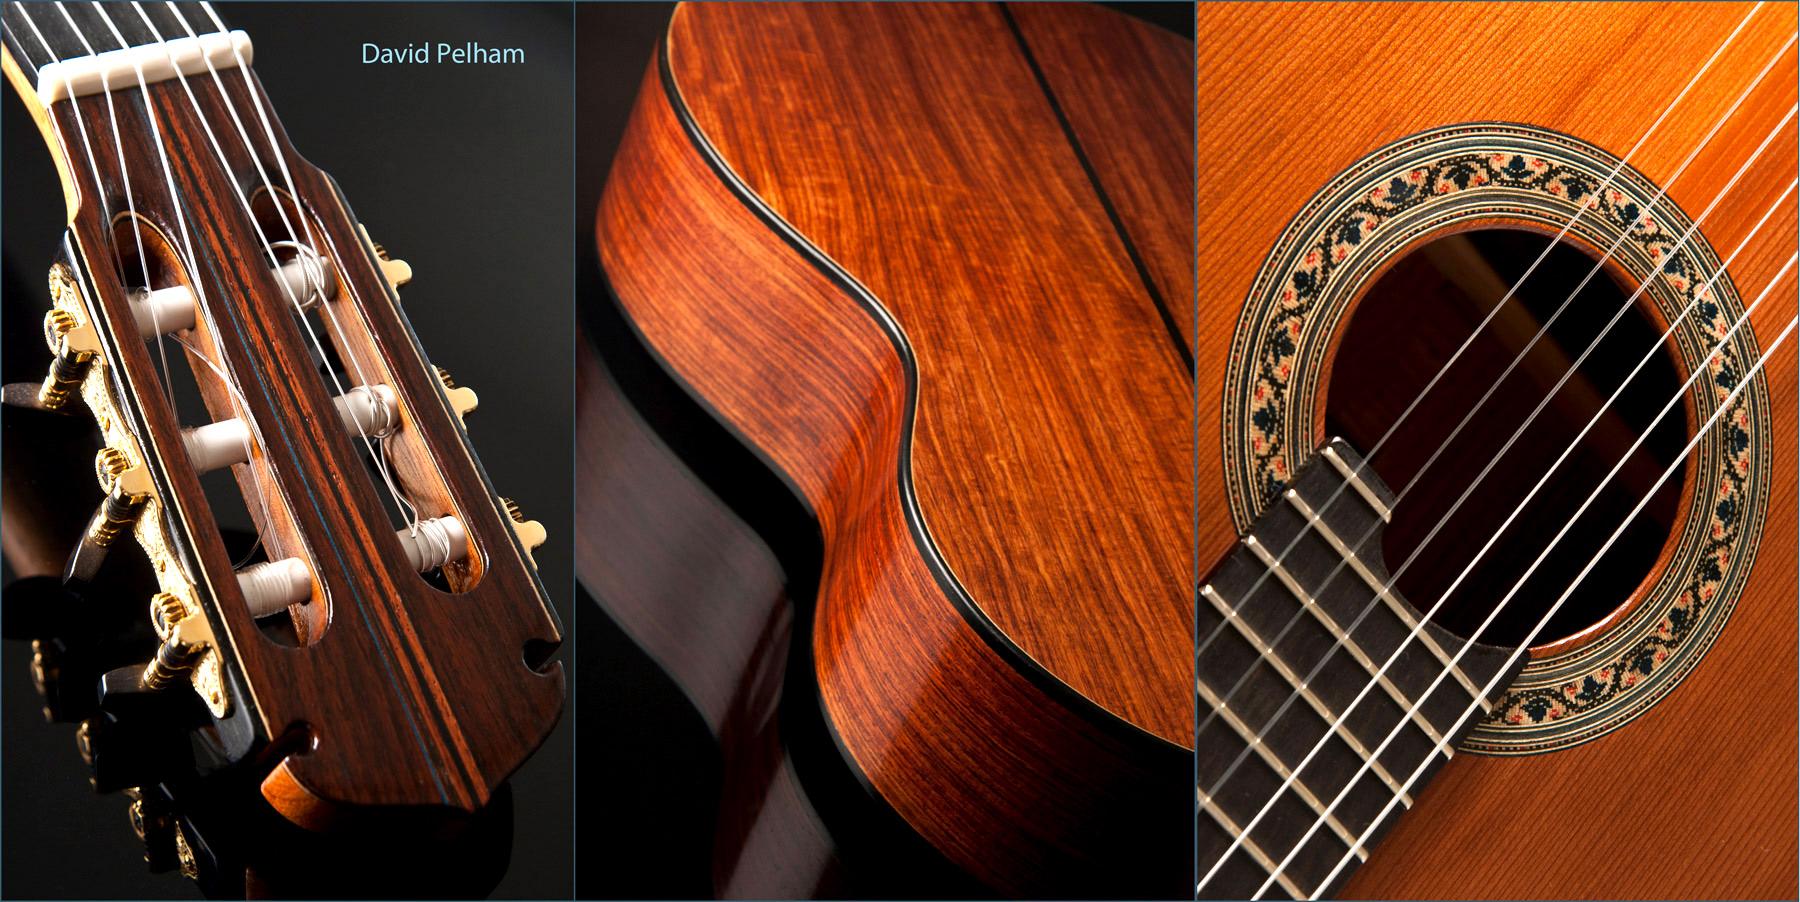 David Pelham Guitar 2-Musicman Photography